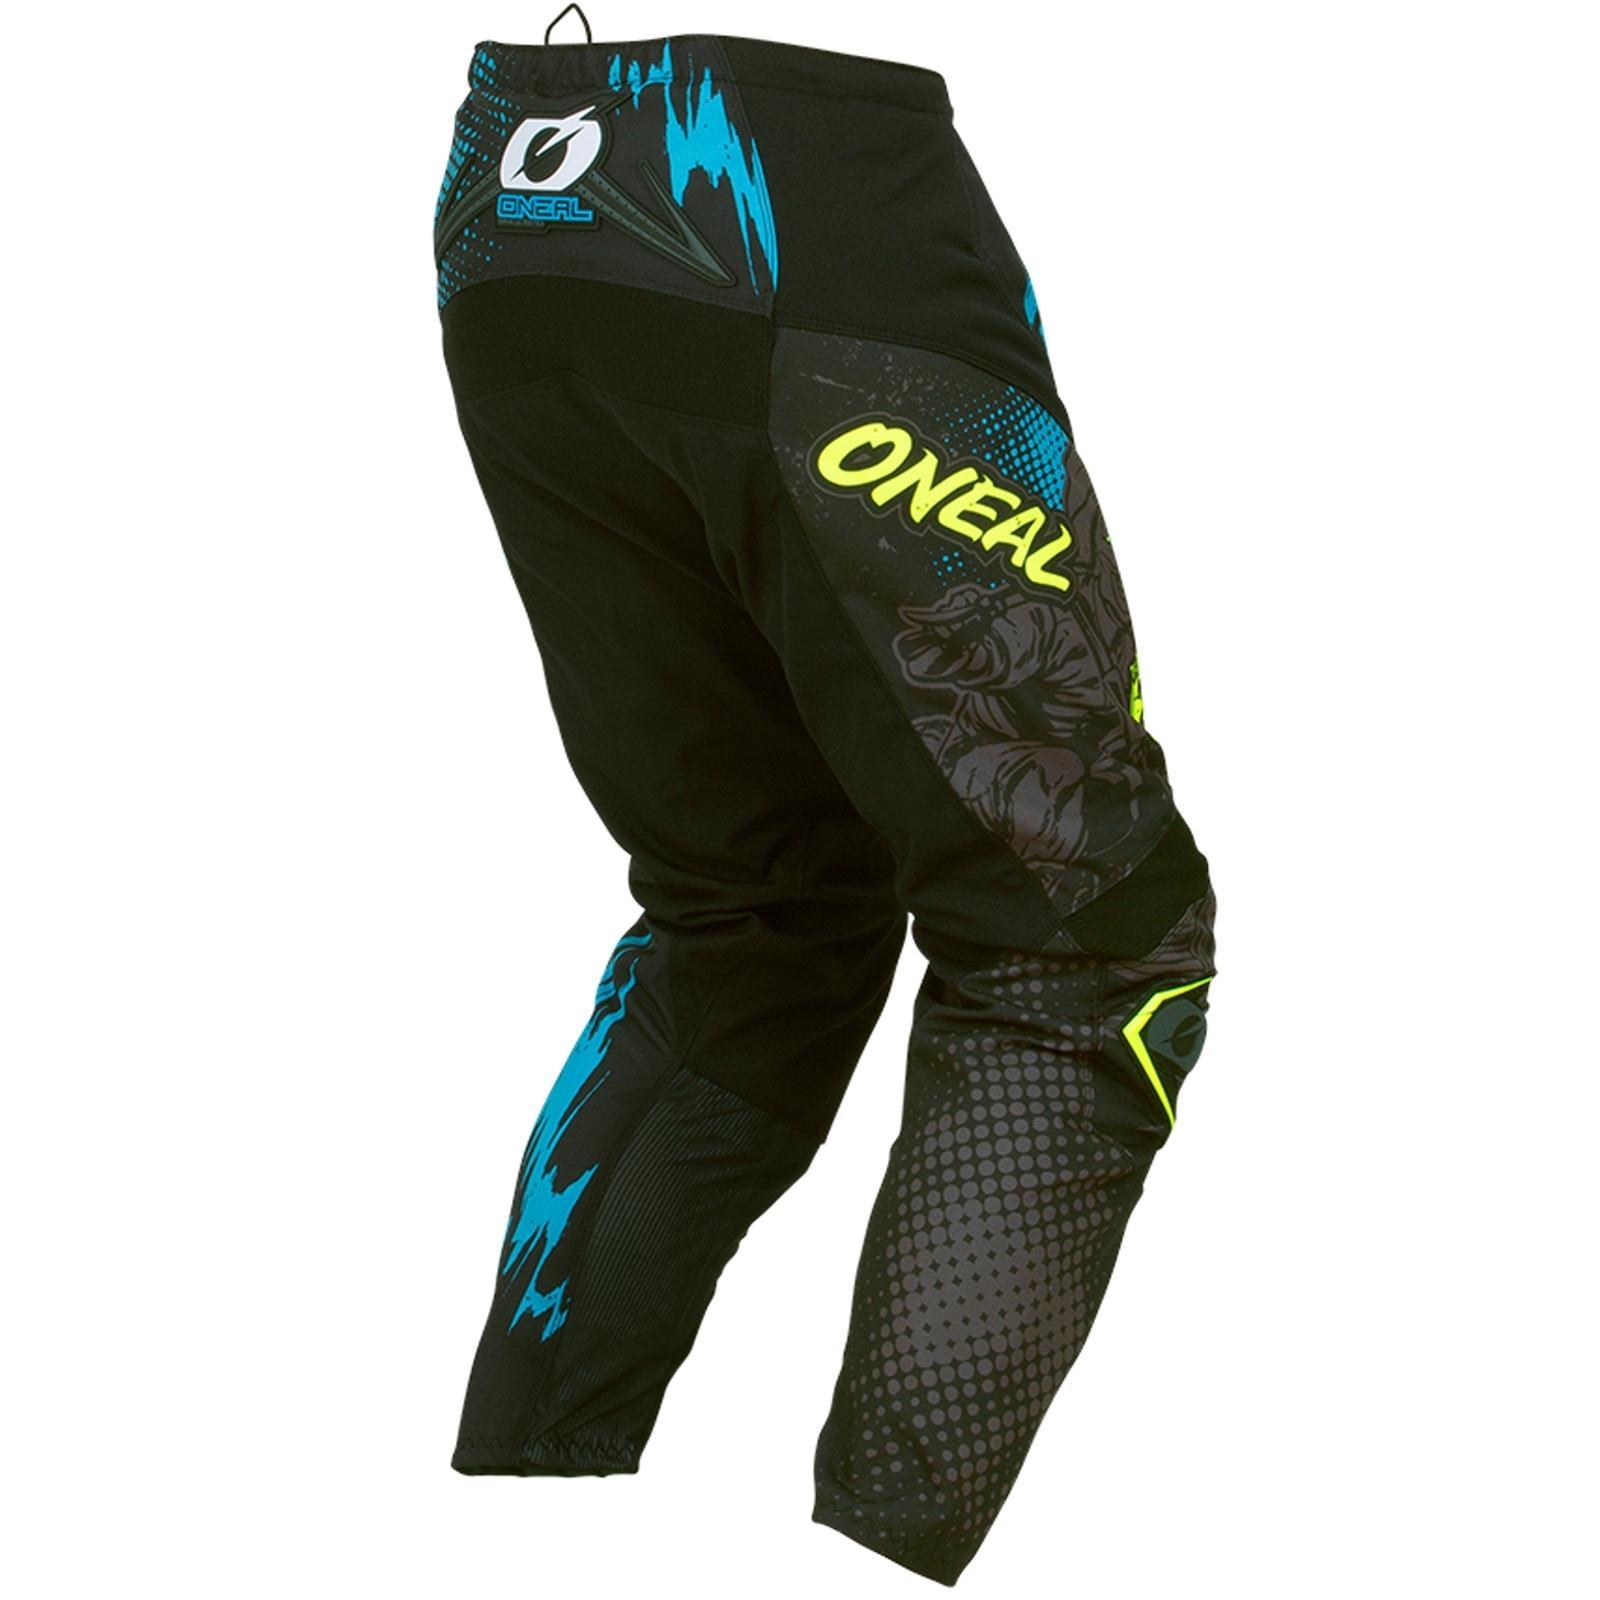 Oneal-elemento-Mayhem-Hardwear-Pants-pantalones-MX-DH-FR-Moto-Cross-Enduro-MTB-moto miniatura 33